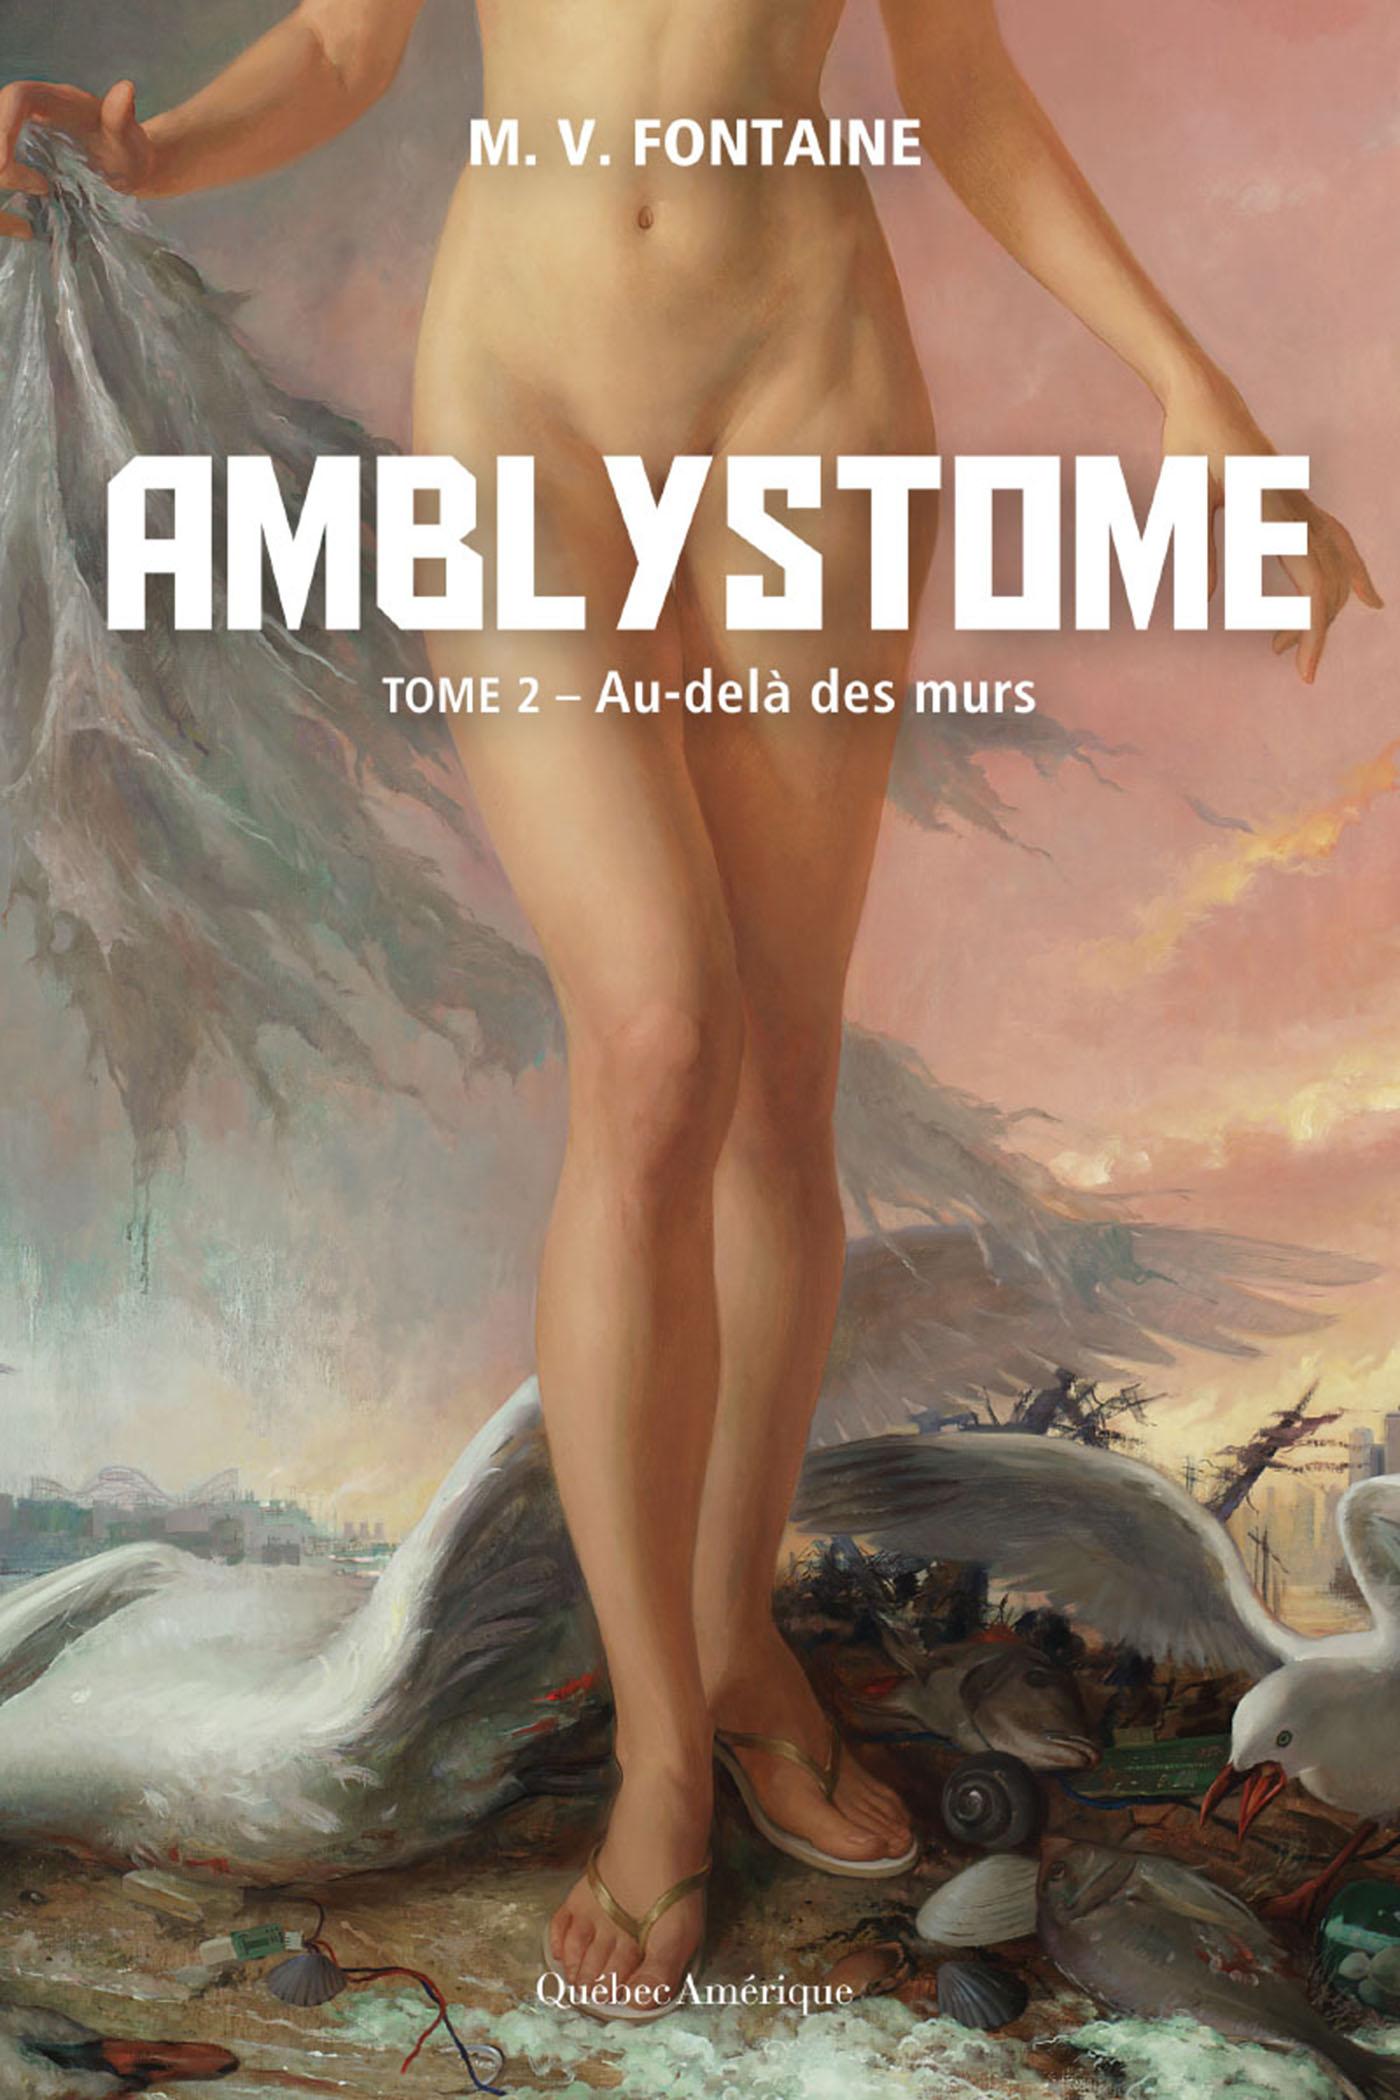 Amblystome 2